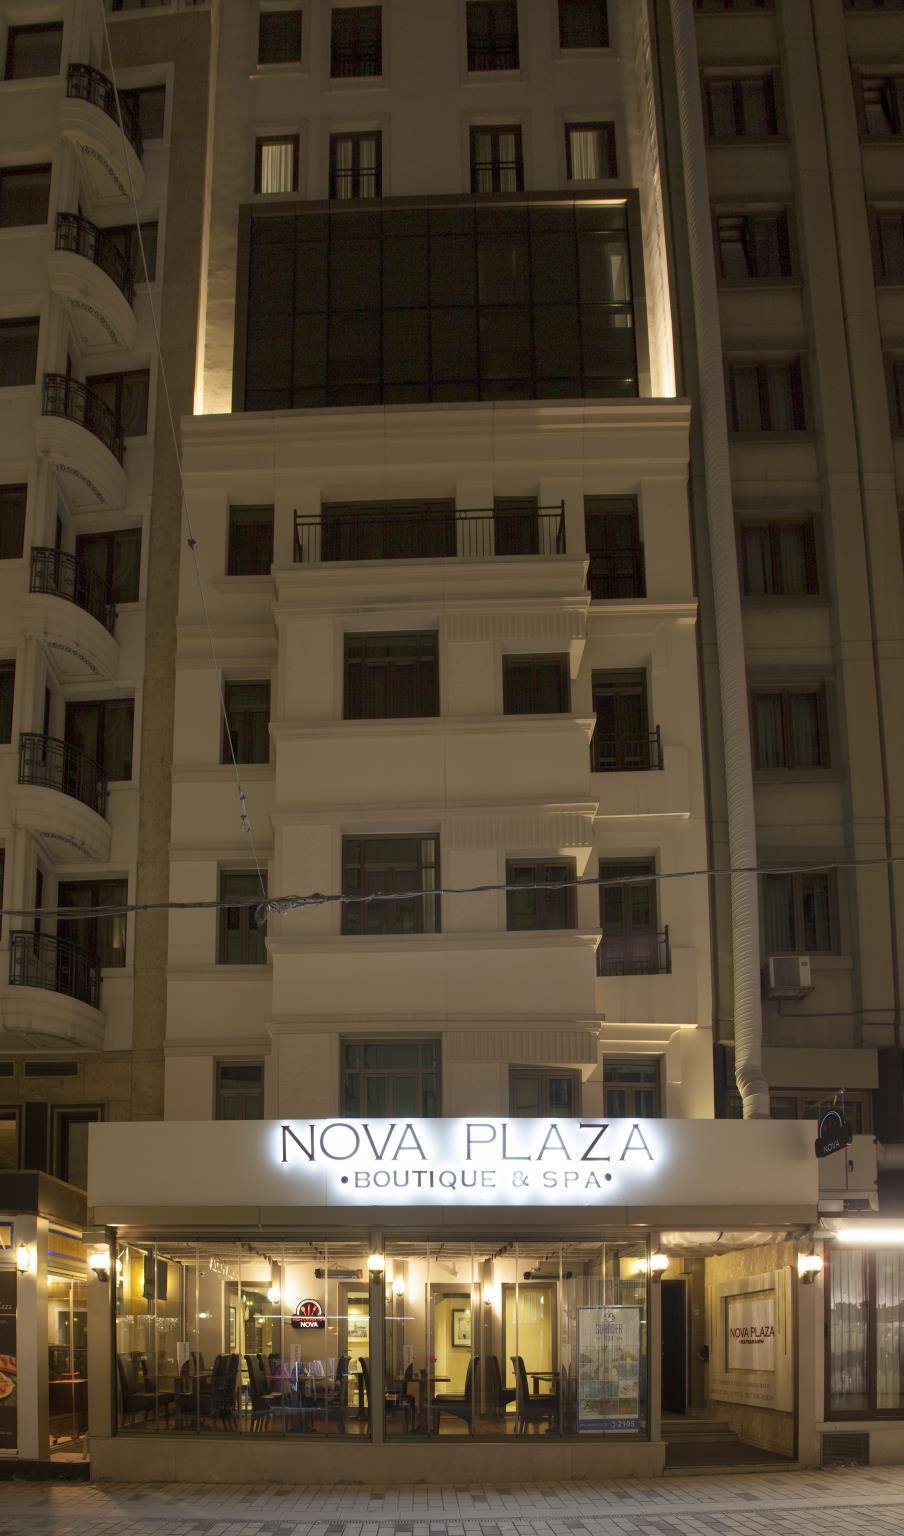 Nova Plaza Boutique And Spa